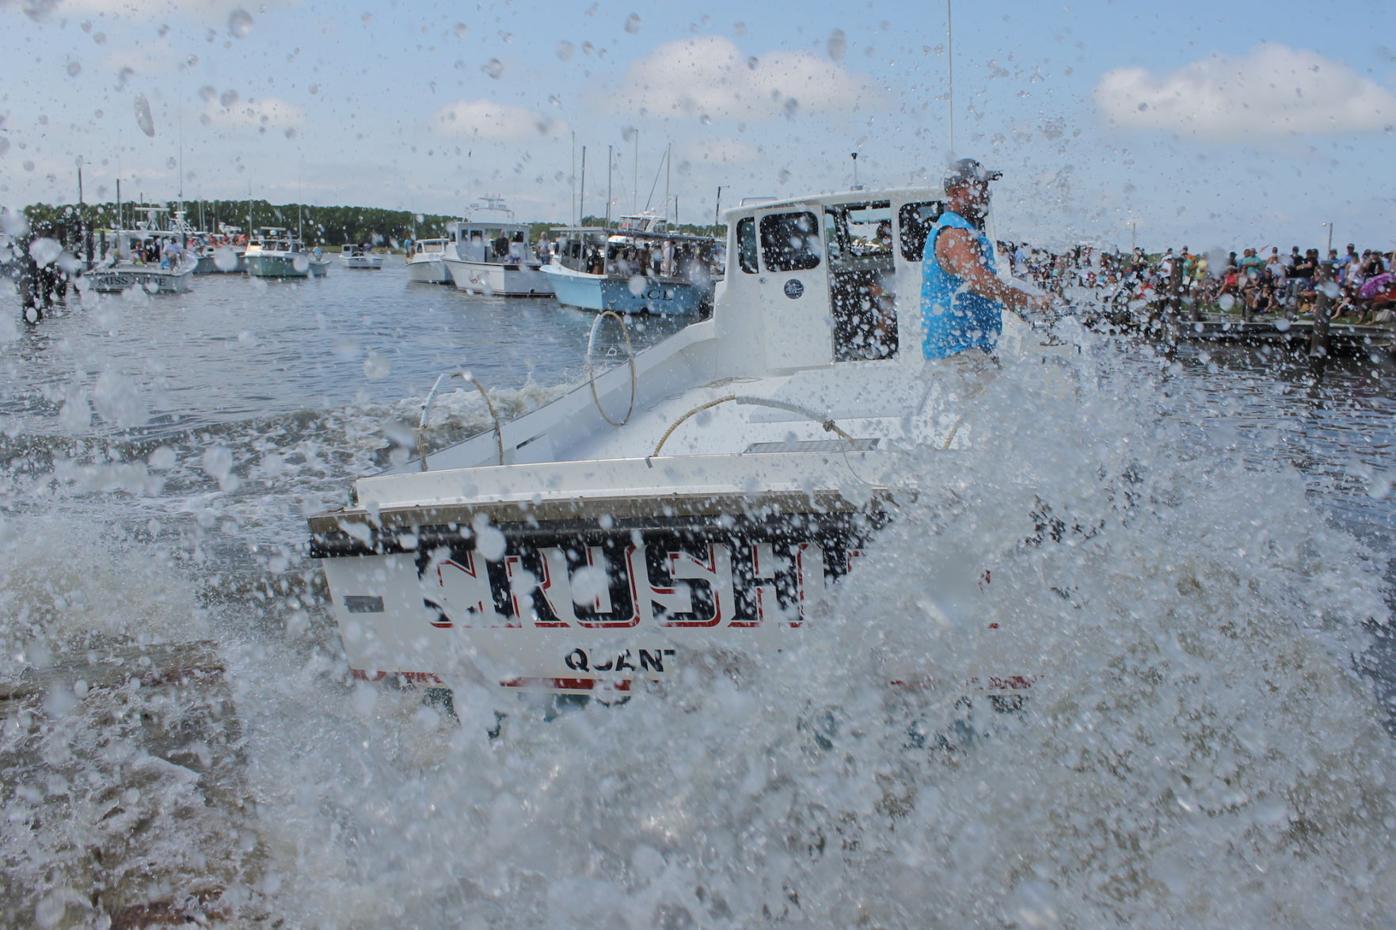 Derrick Hoy's Crusher makes a splash